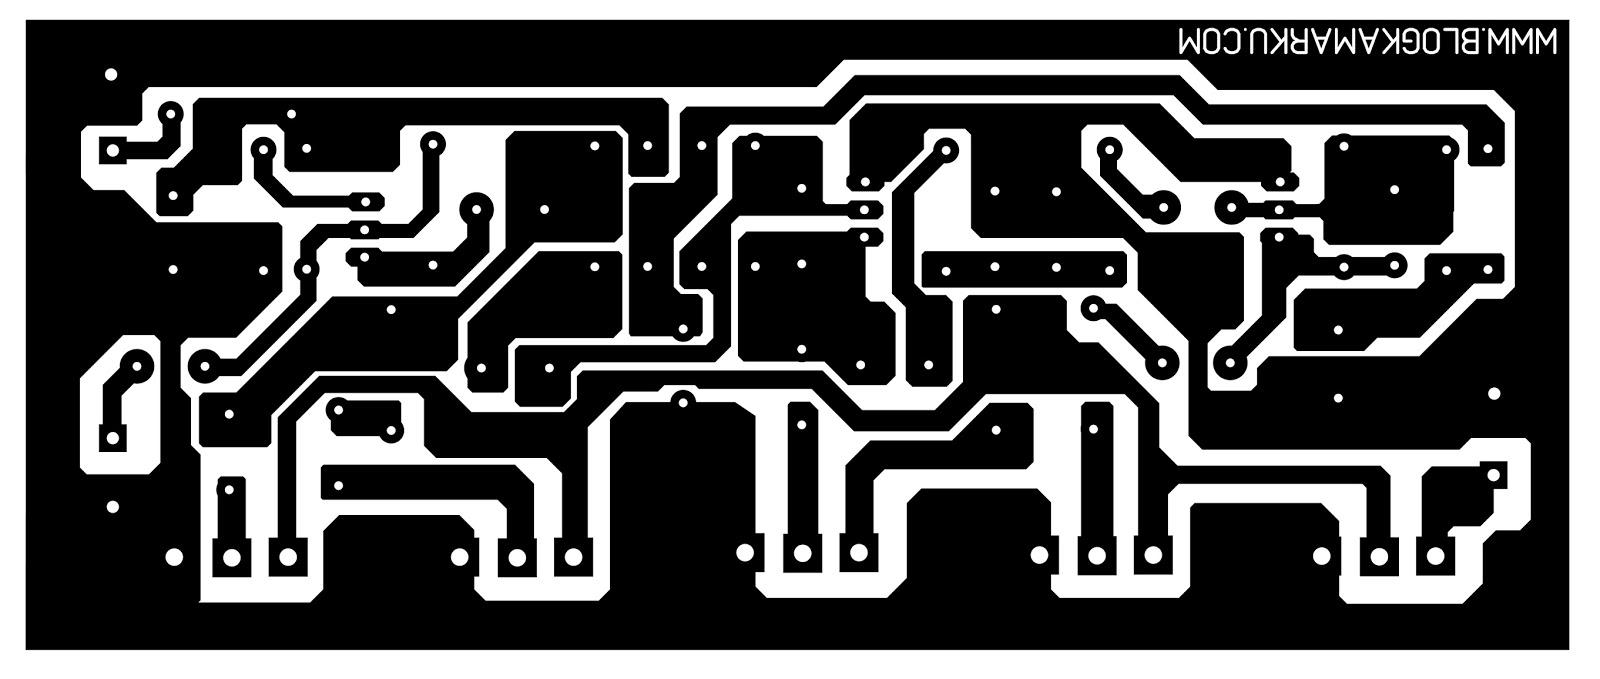 pcb layout Namec Tone Control - Blogkamarku.com